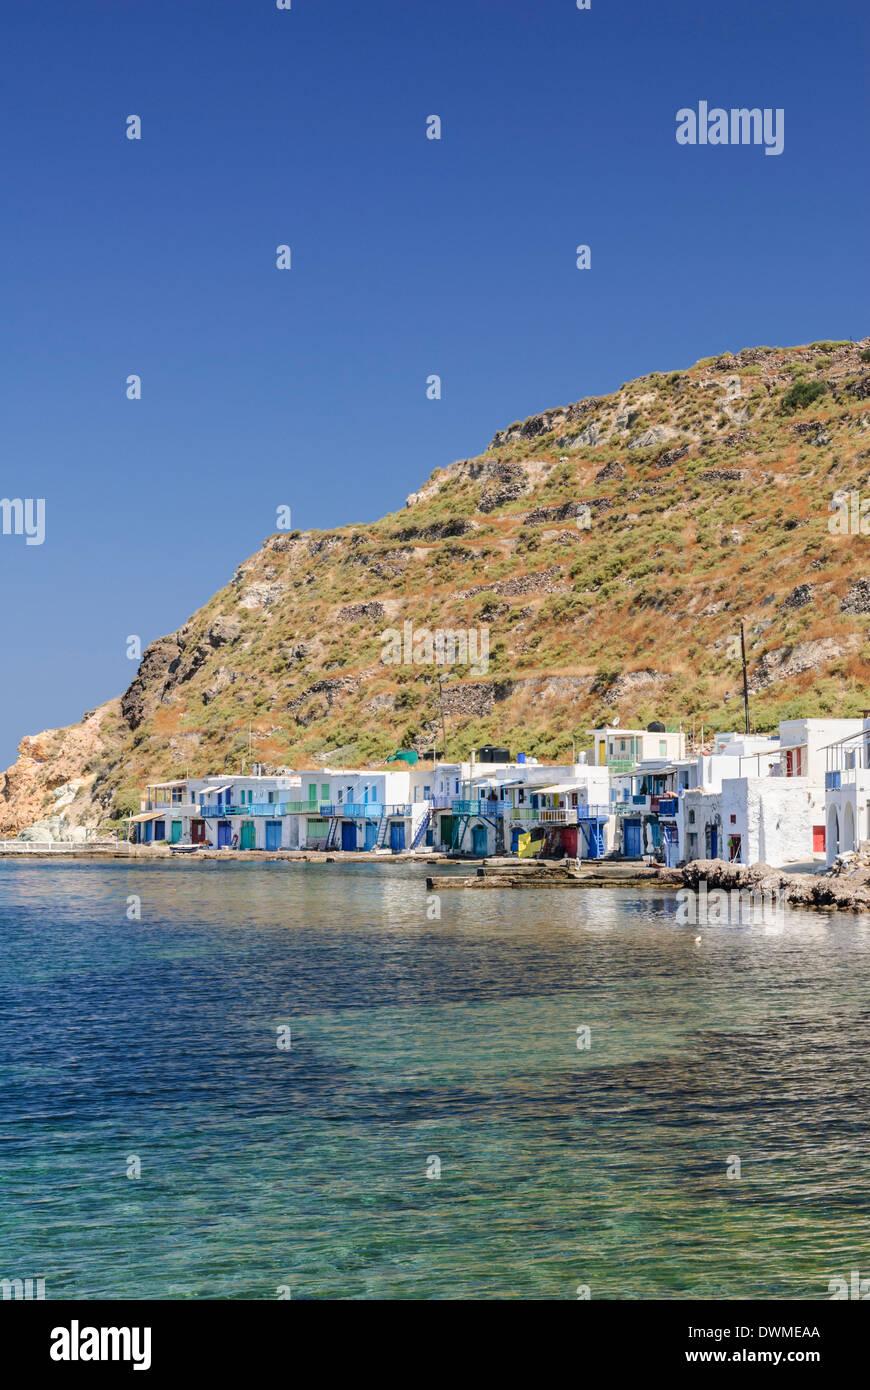 Fisherman's village of Klima on Milos Island, Cyclades, Greece - Stock Image